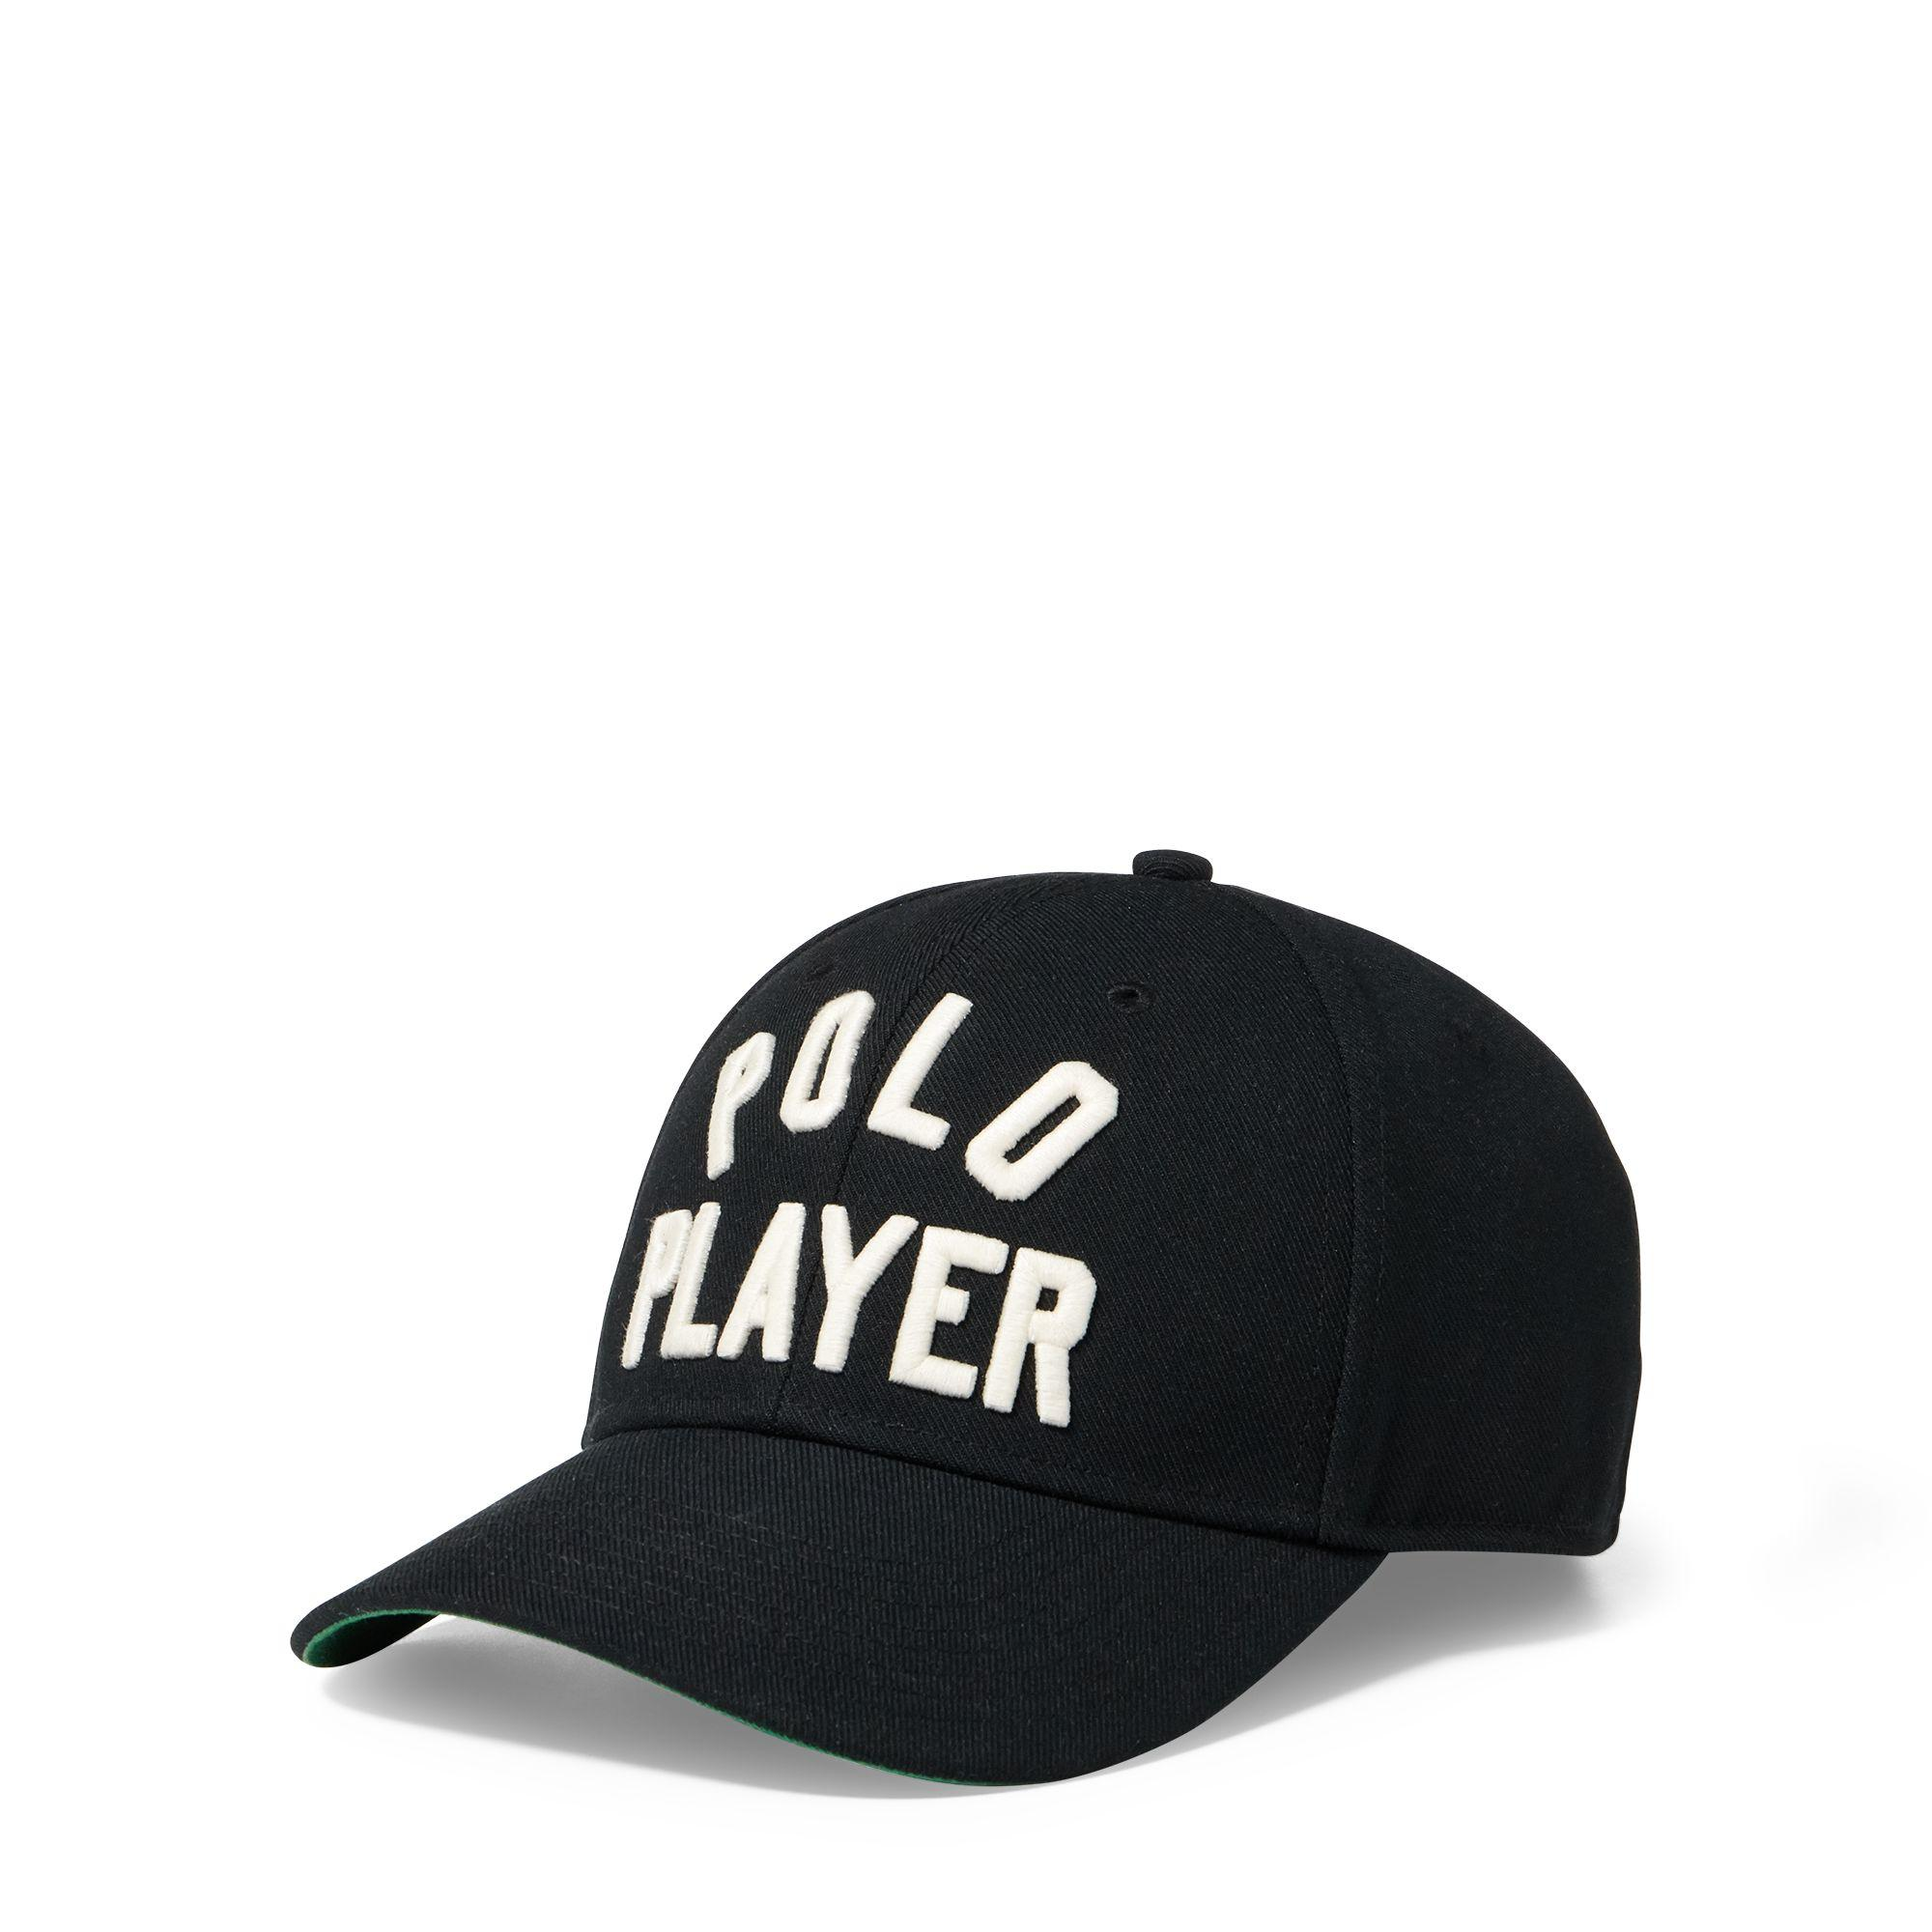 Lyst - Polo Ralph Lauren Polo Player Twill Baseball Cap in Black for Men 9ae194ff8cc